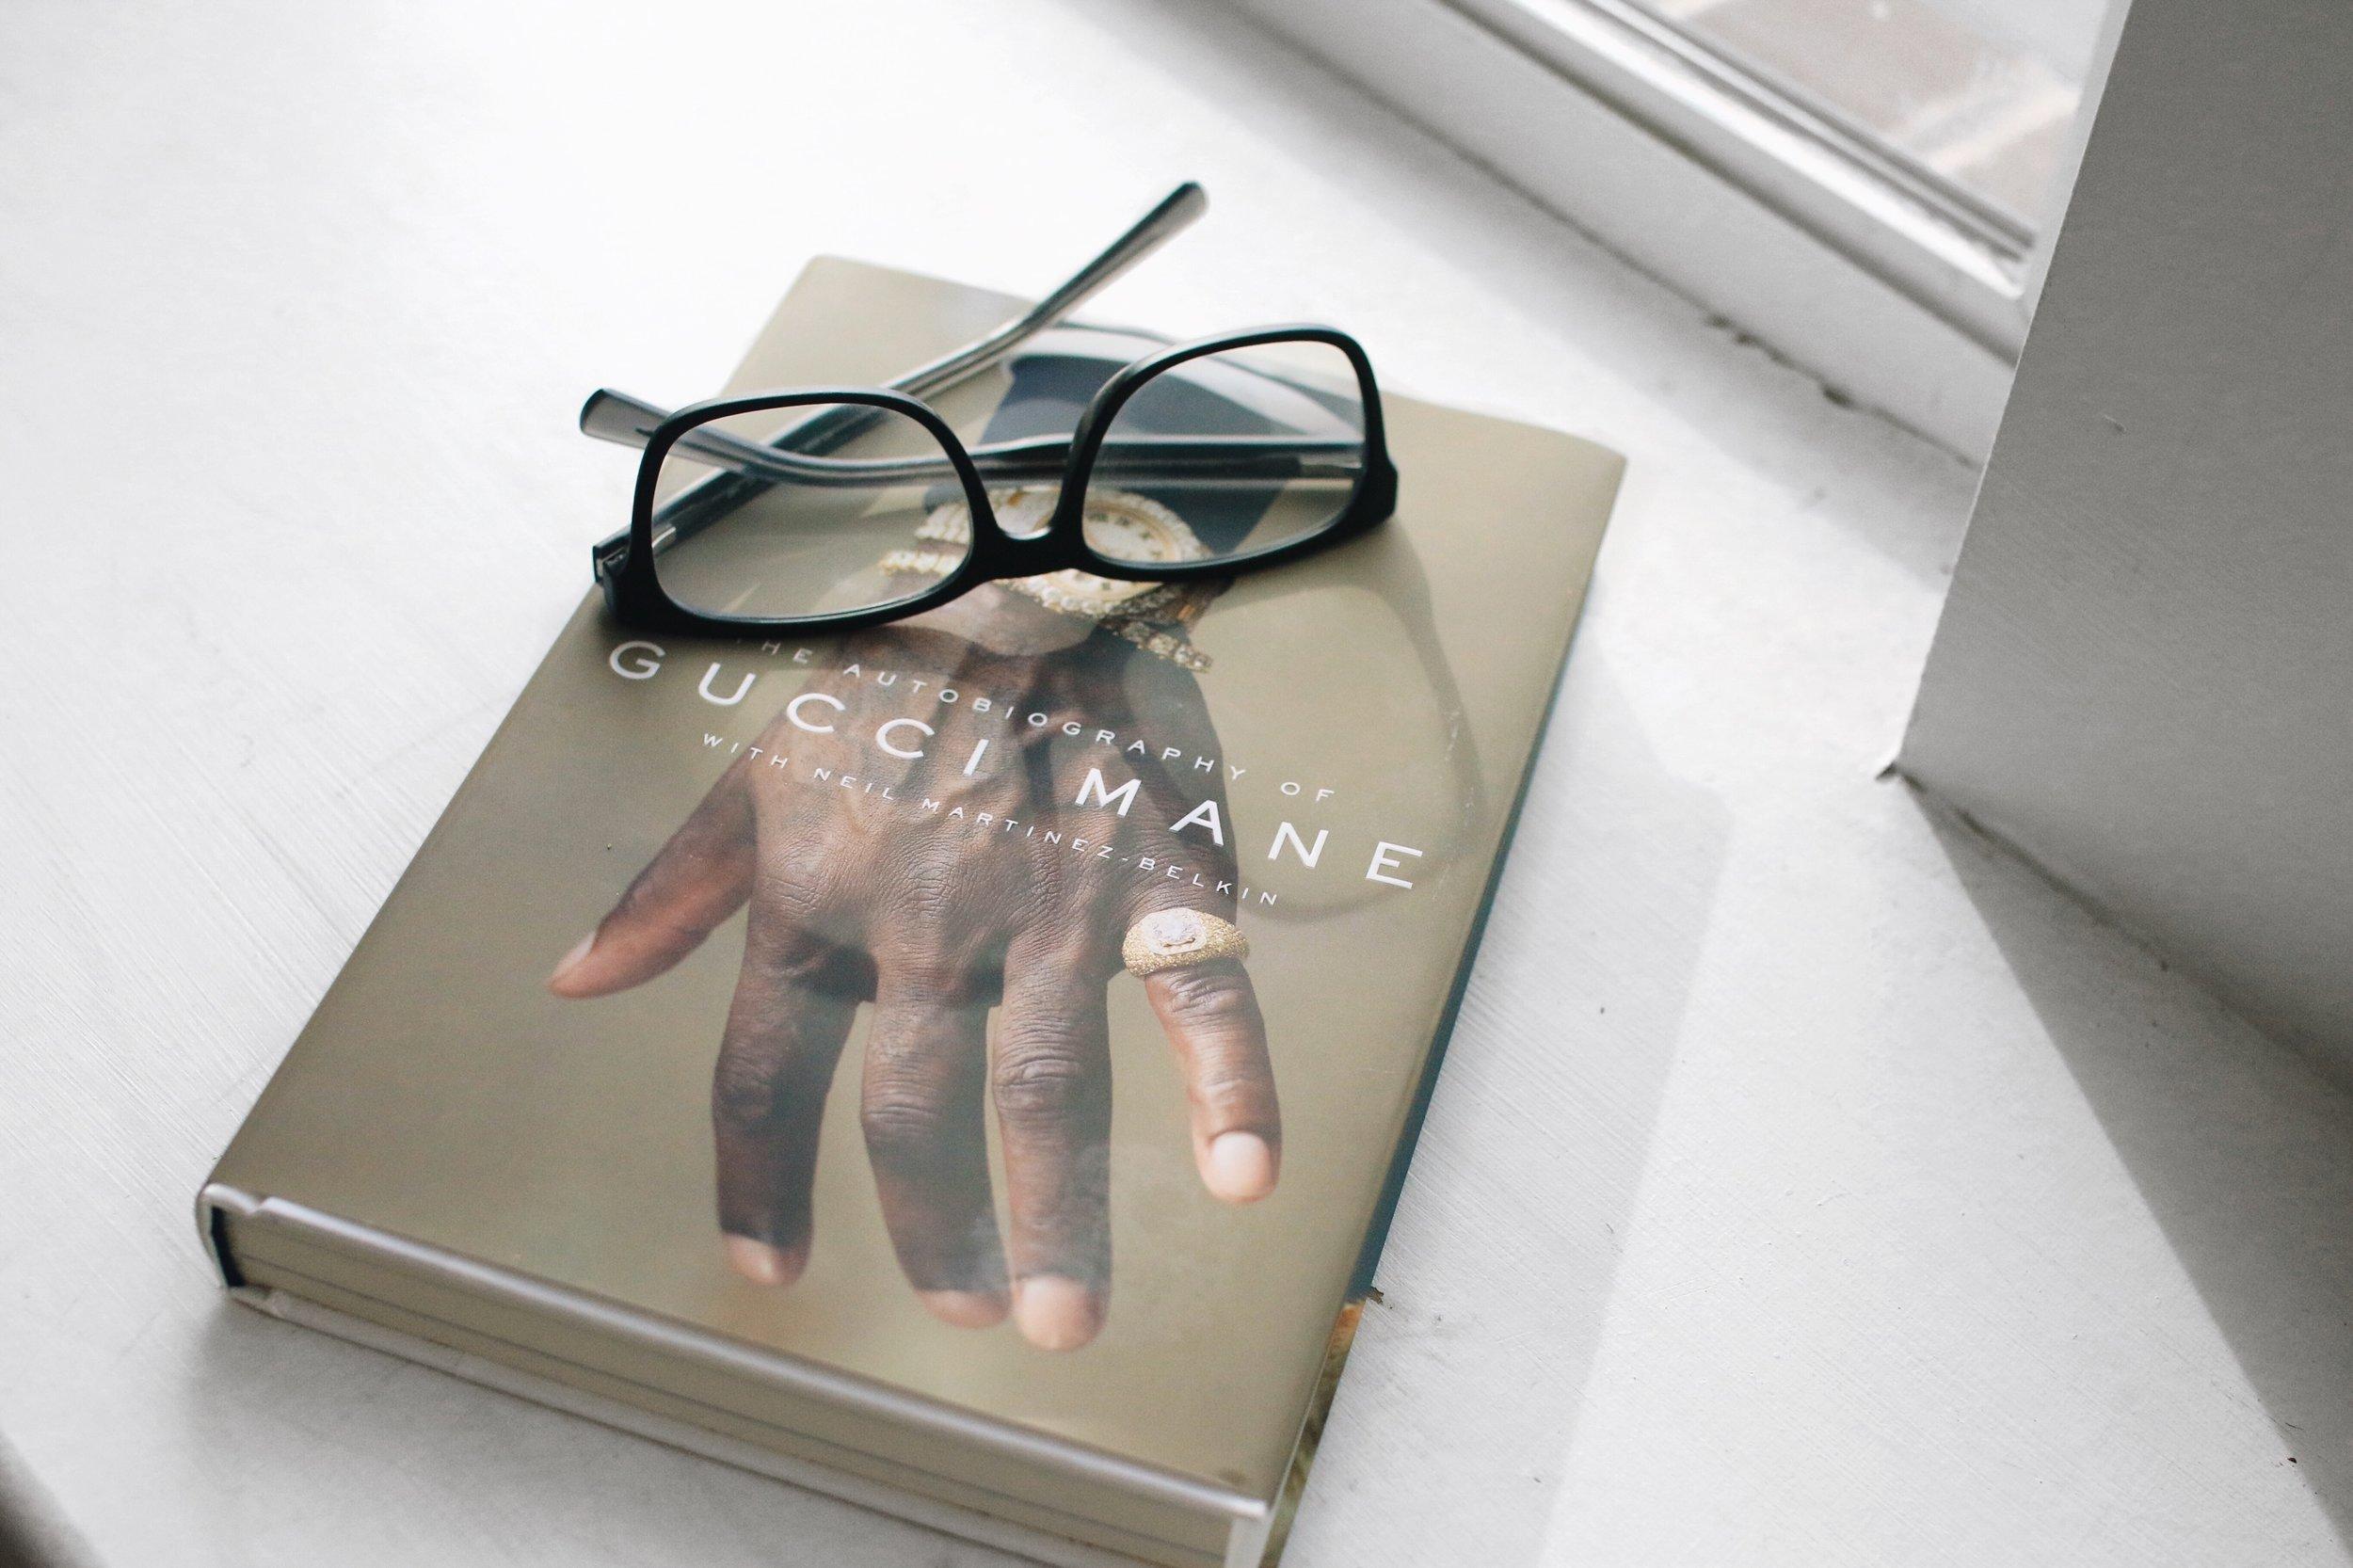 gucci mane autobiography + review